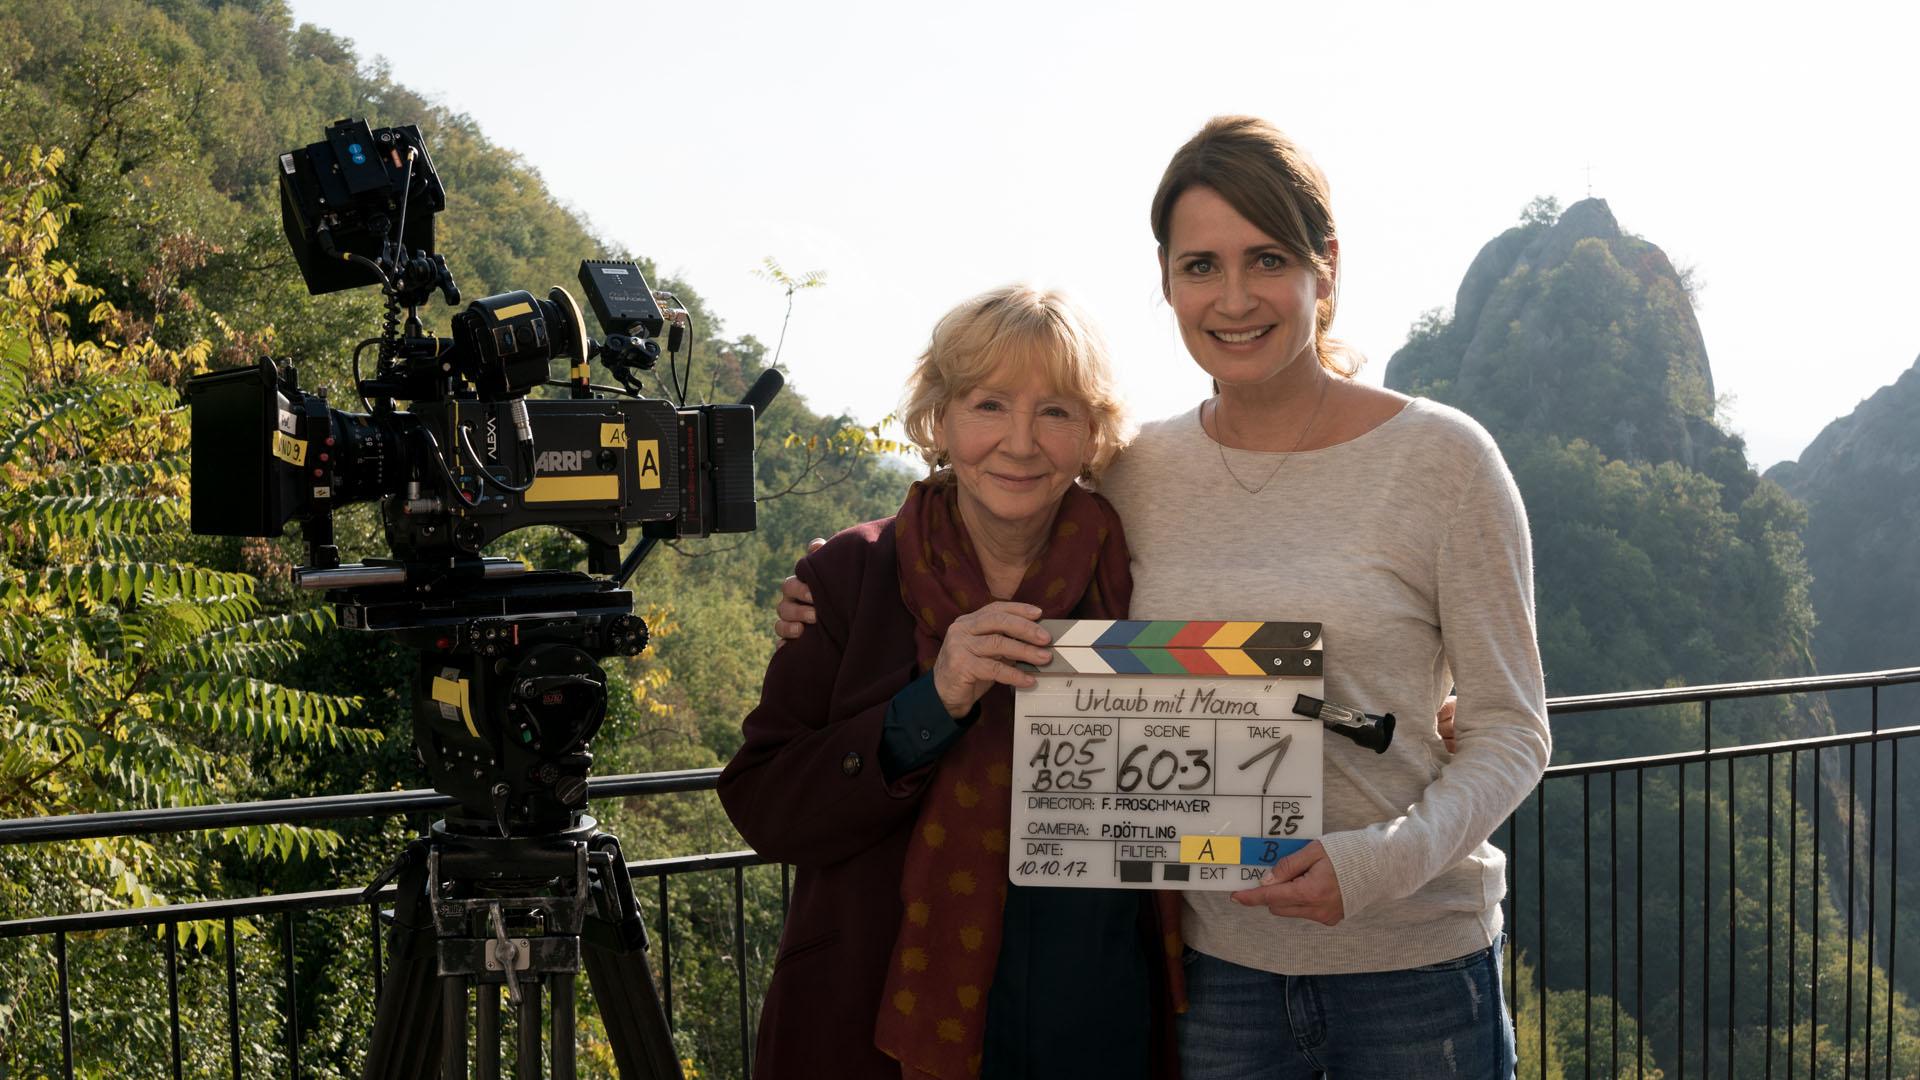 Abgedreht Urlaub Mit Mama At Degeto Film Gmbh